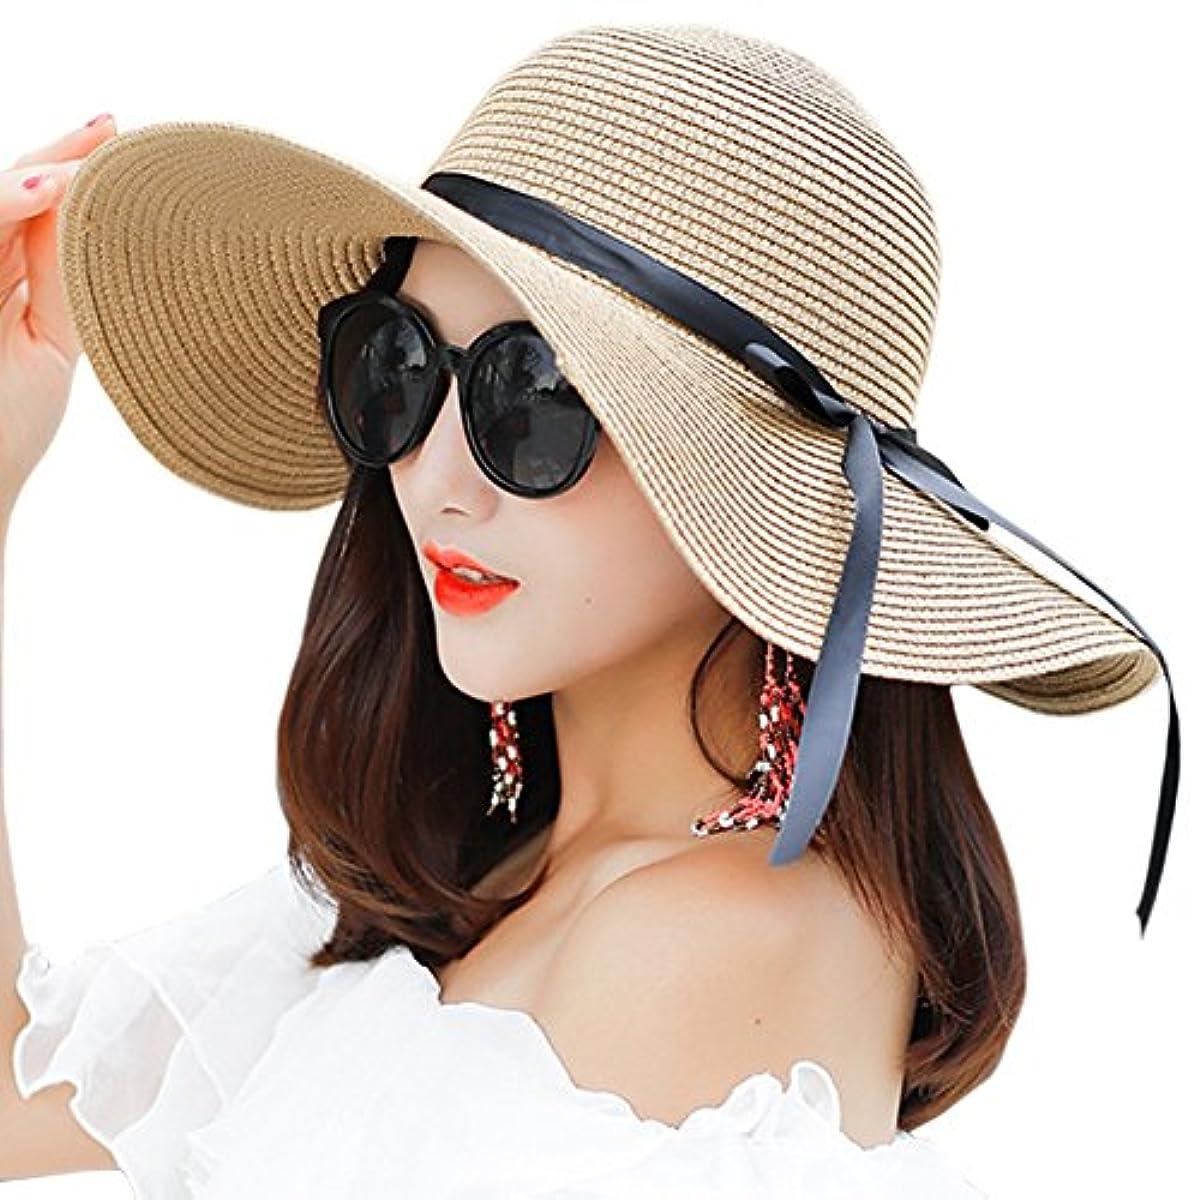 be573c959892a Details about Women s Big Brim Sun Hat Floppy Foldable Bowknot Straw Hat  Summer Beach Hat